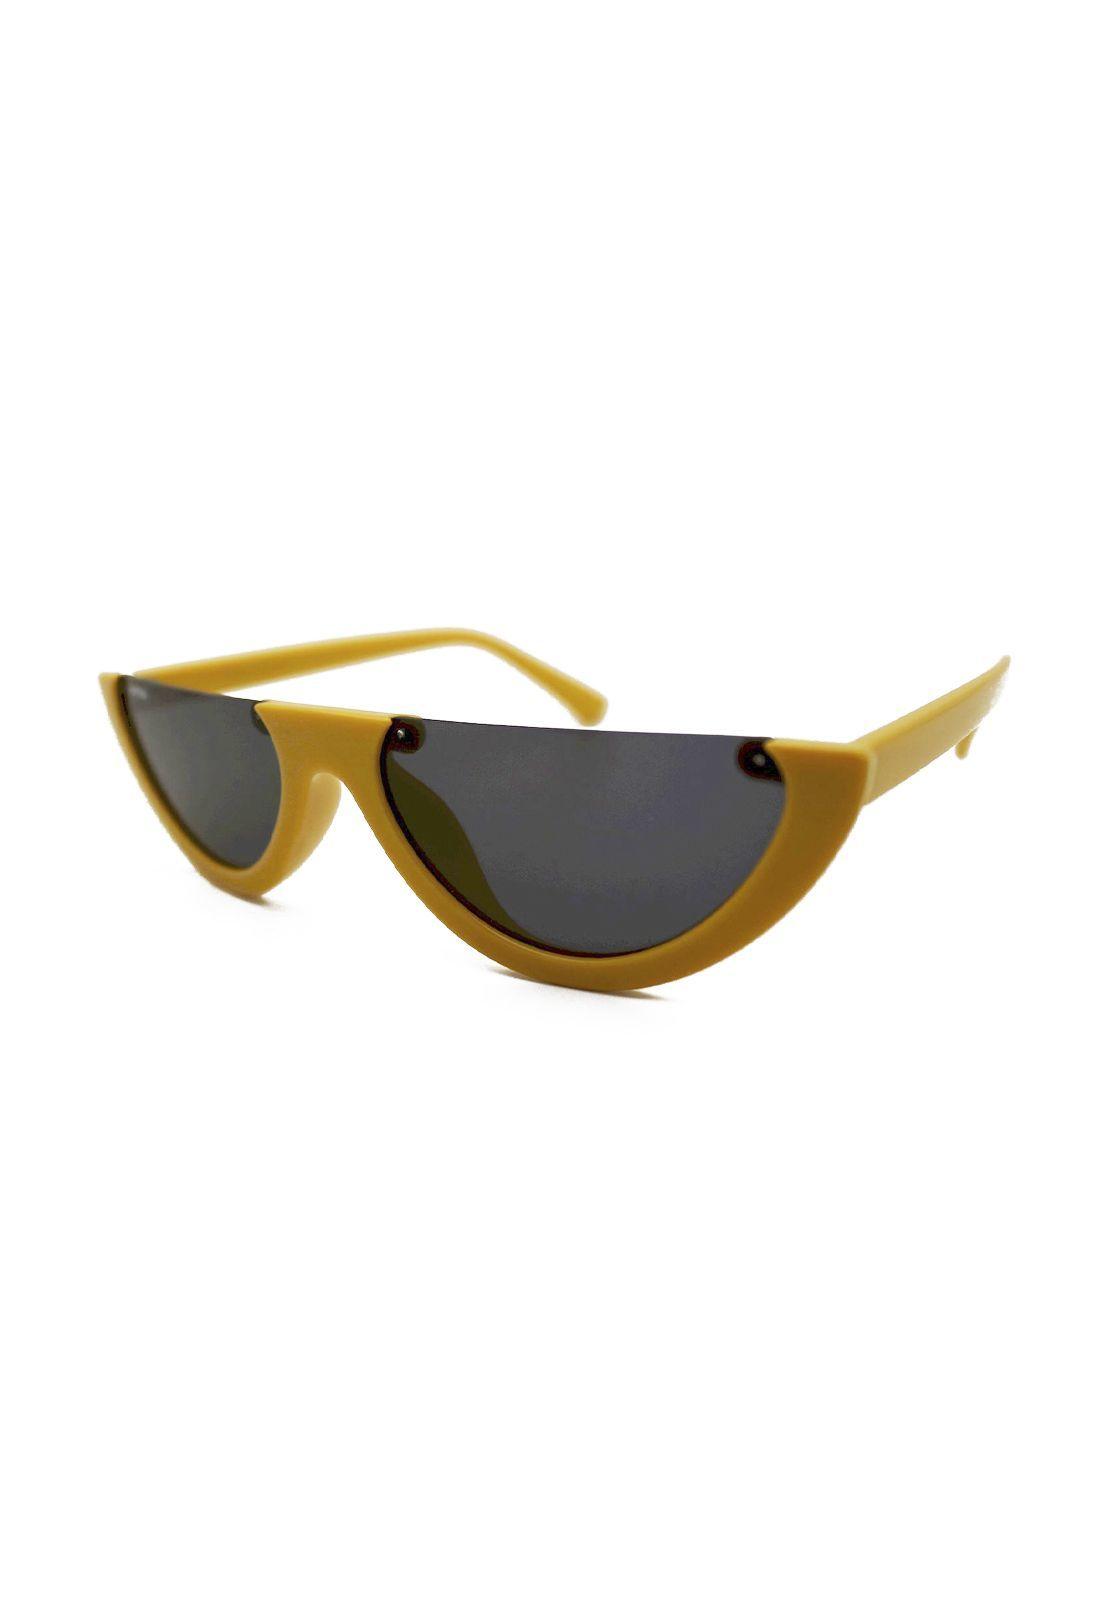 Óculos de Sol Grungetteria Pandeirola